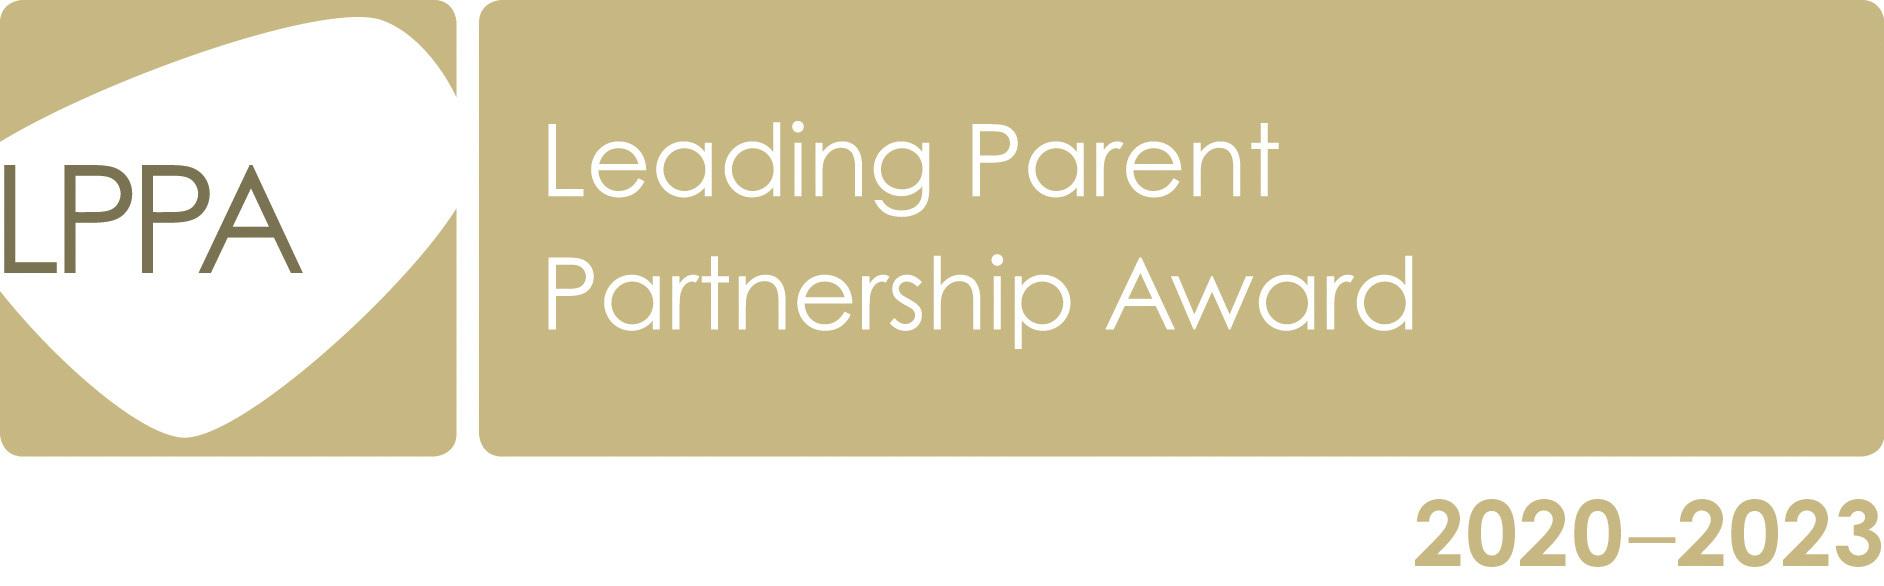 Leading Parent Partnership Award logo